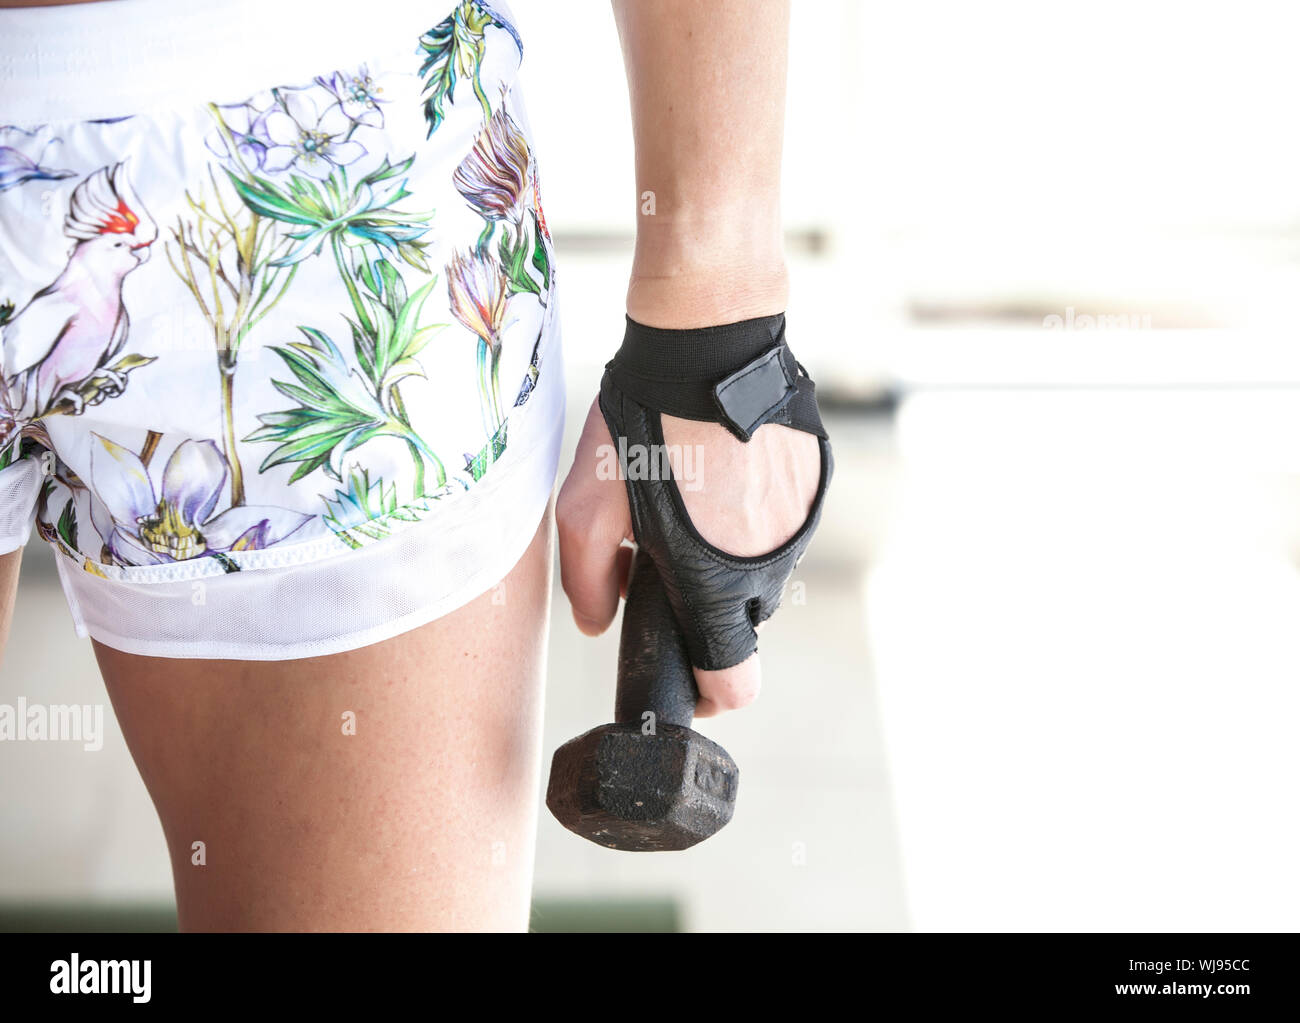 Cropped Image Of Female Athlete Exercising With Dumbbell At Gym Stock Photo